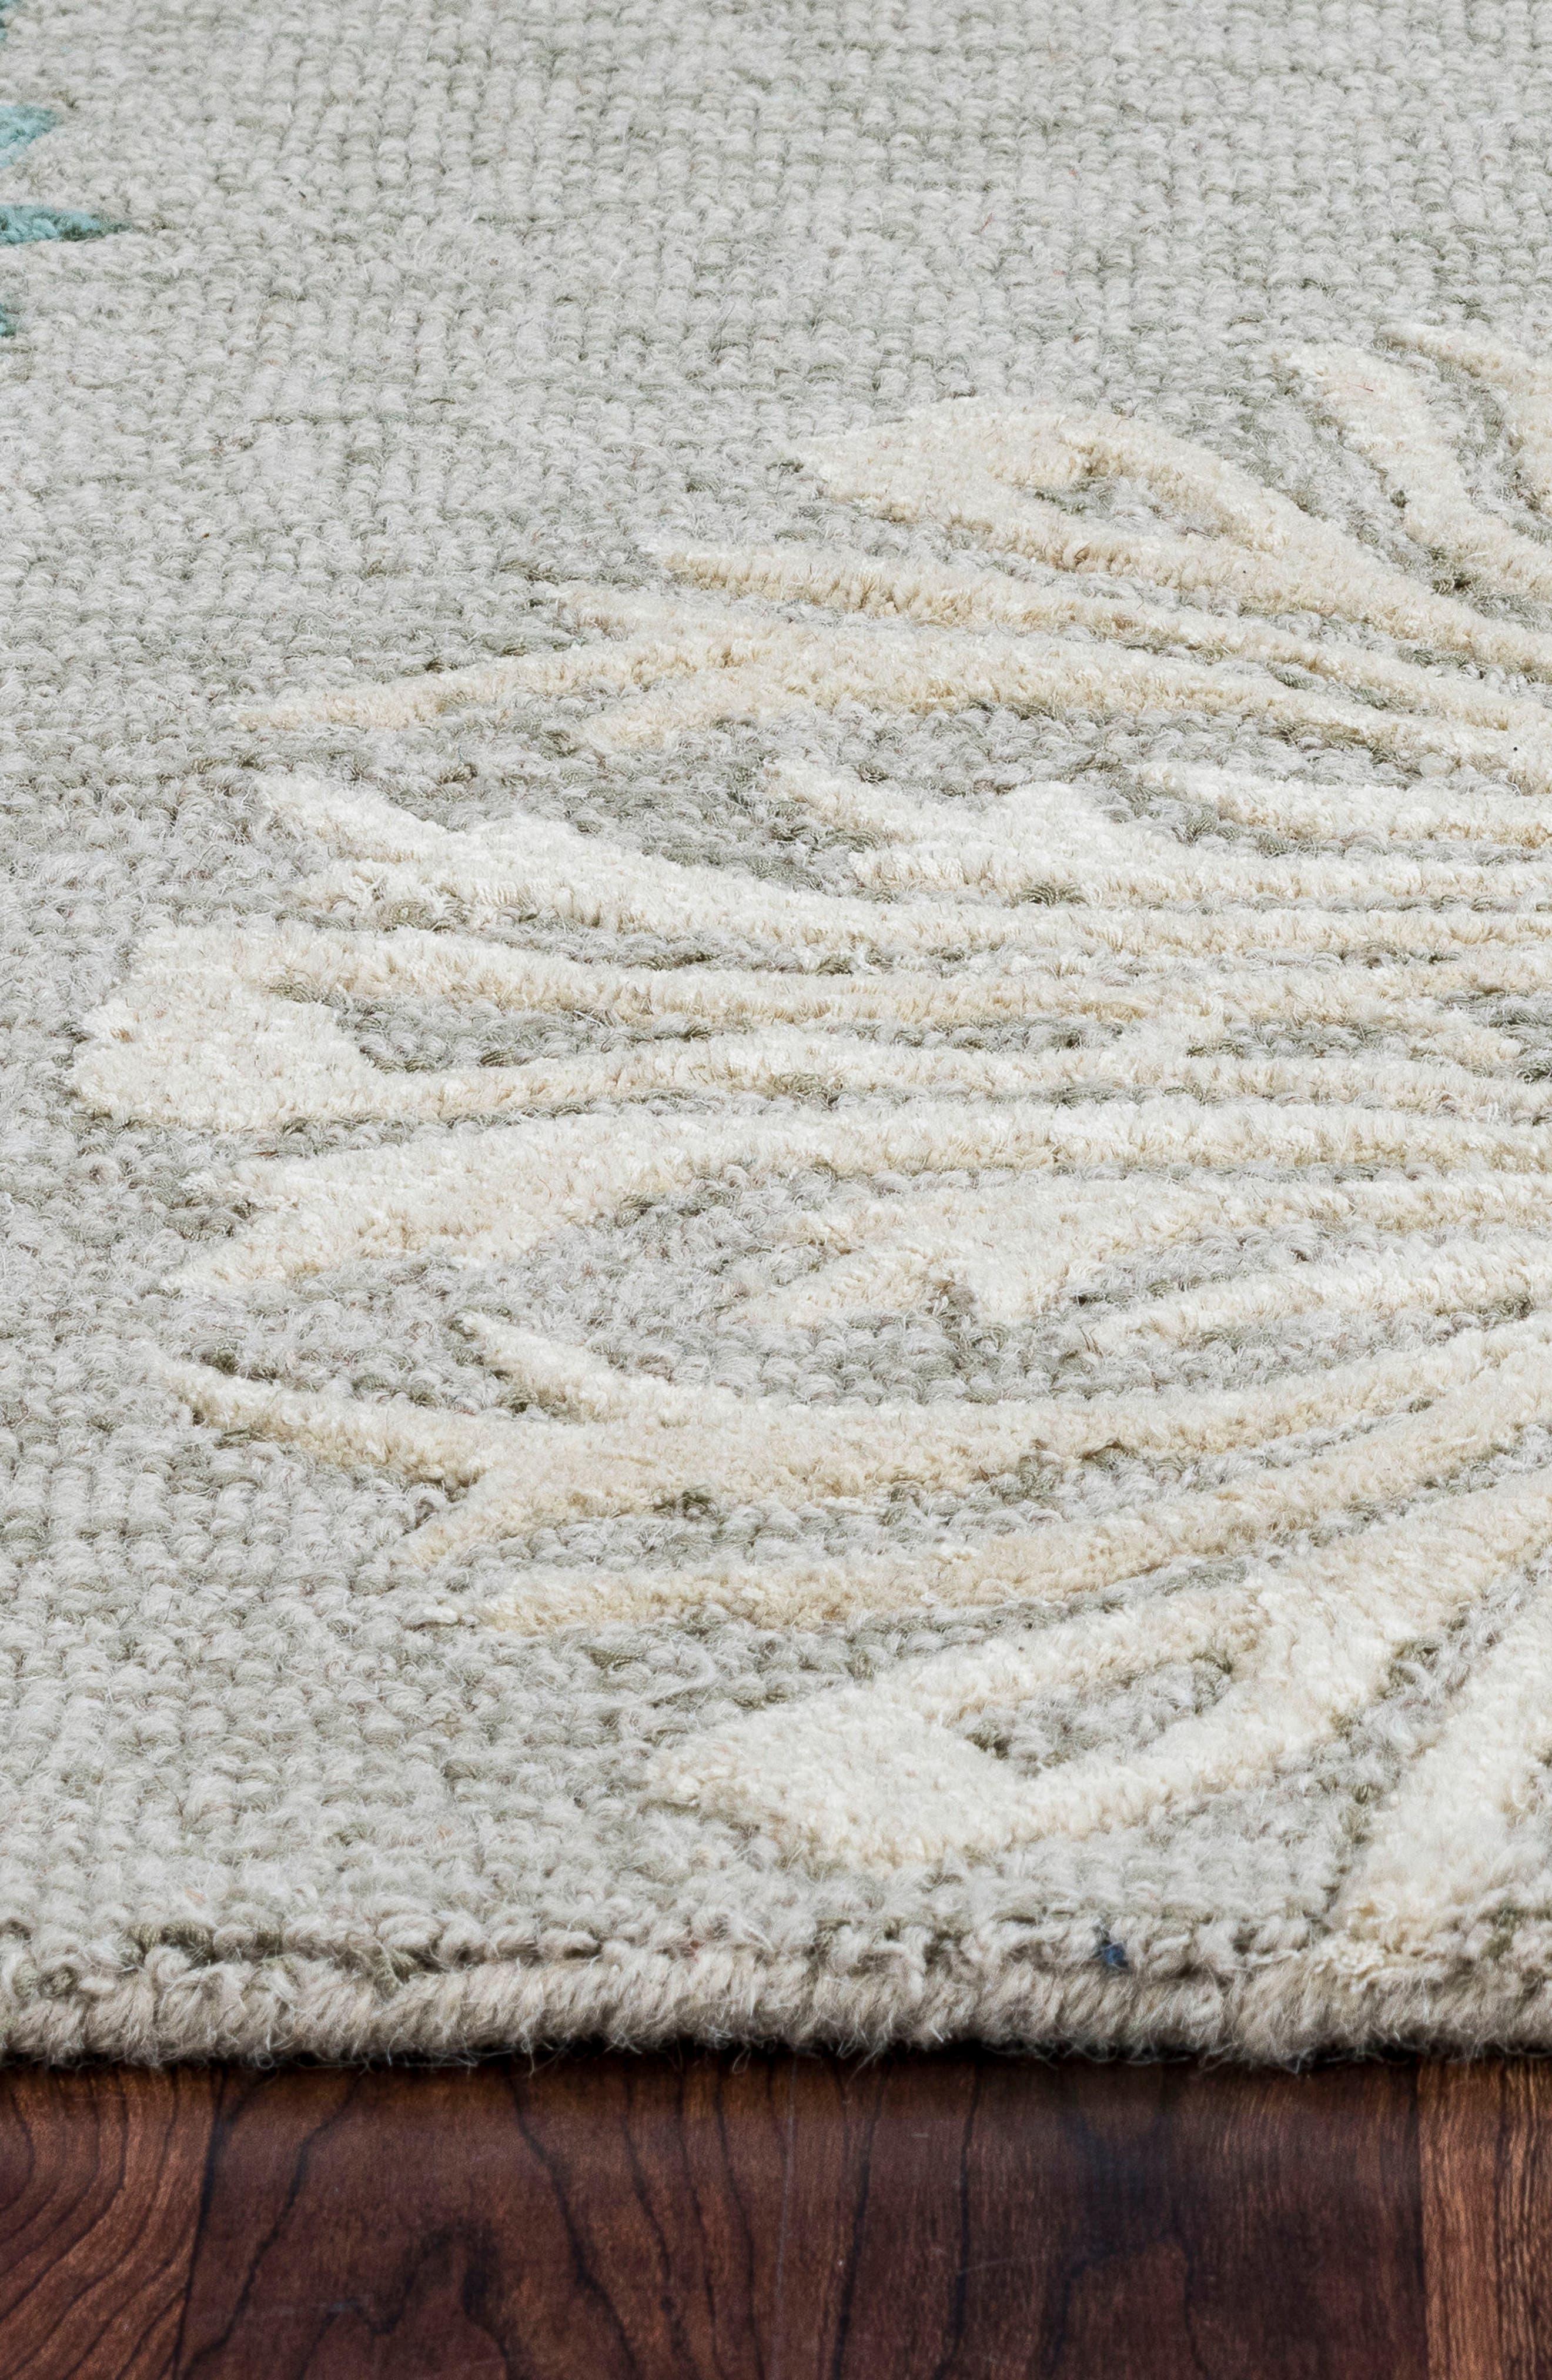 'Dimensional' Wool Area Rug,                             Alternate thumbnail 4, color,